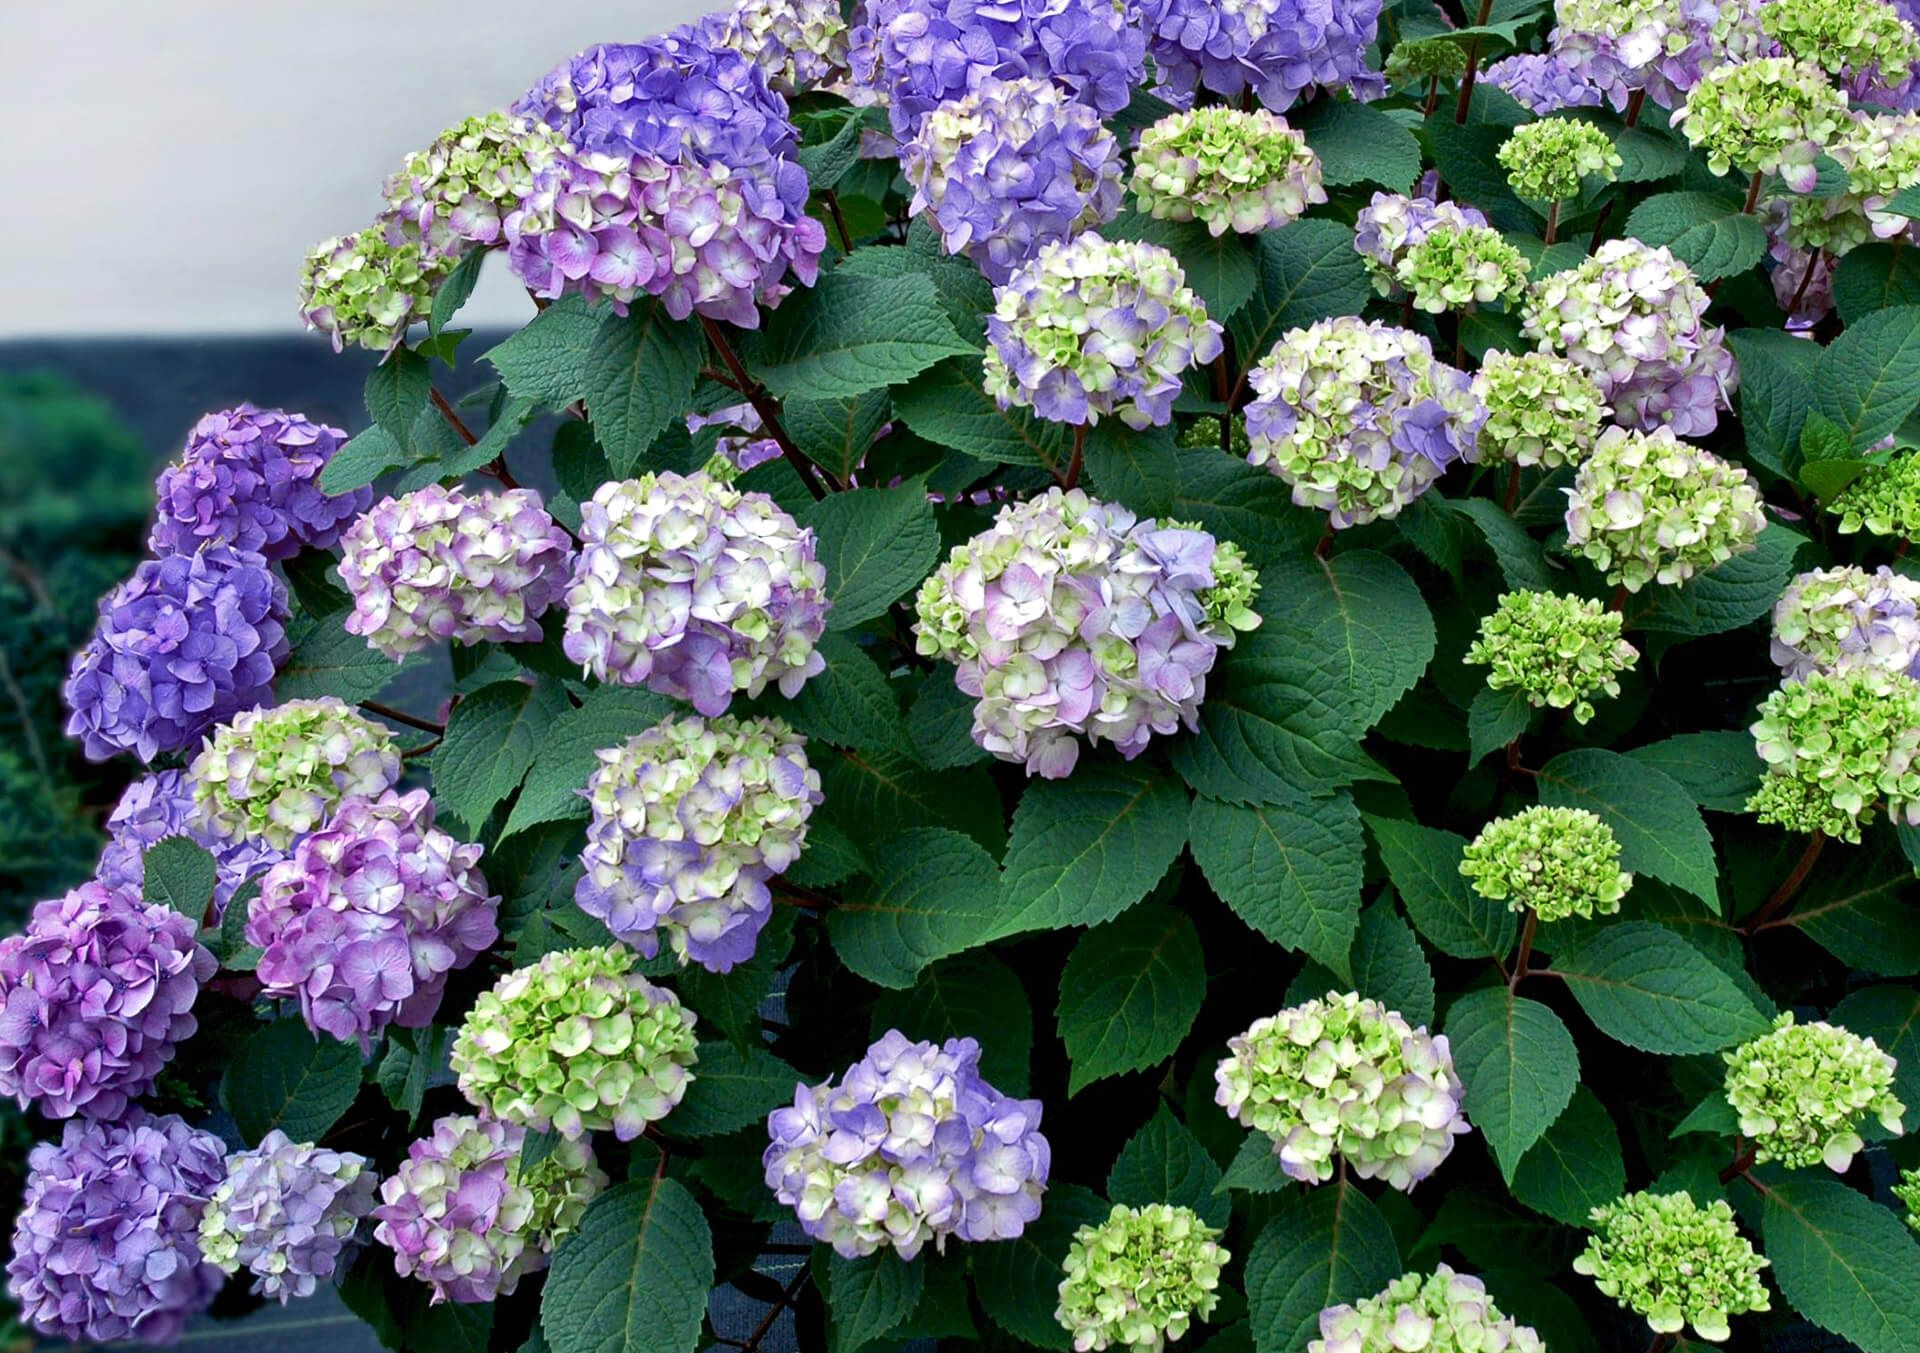 Garden Center, Flower and Plant Store Minnesota Florist